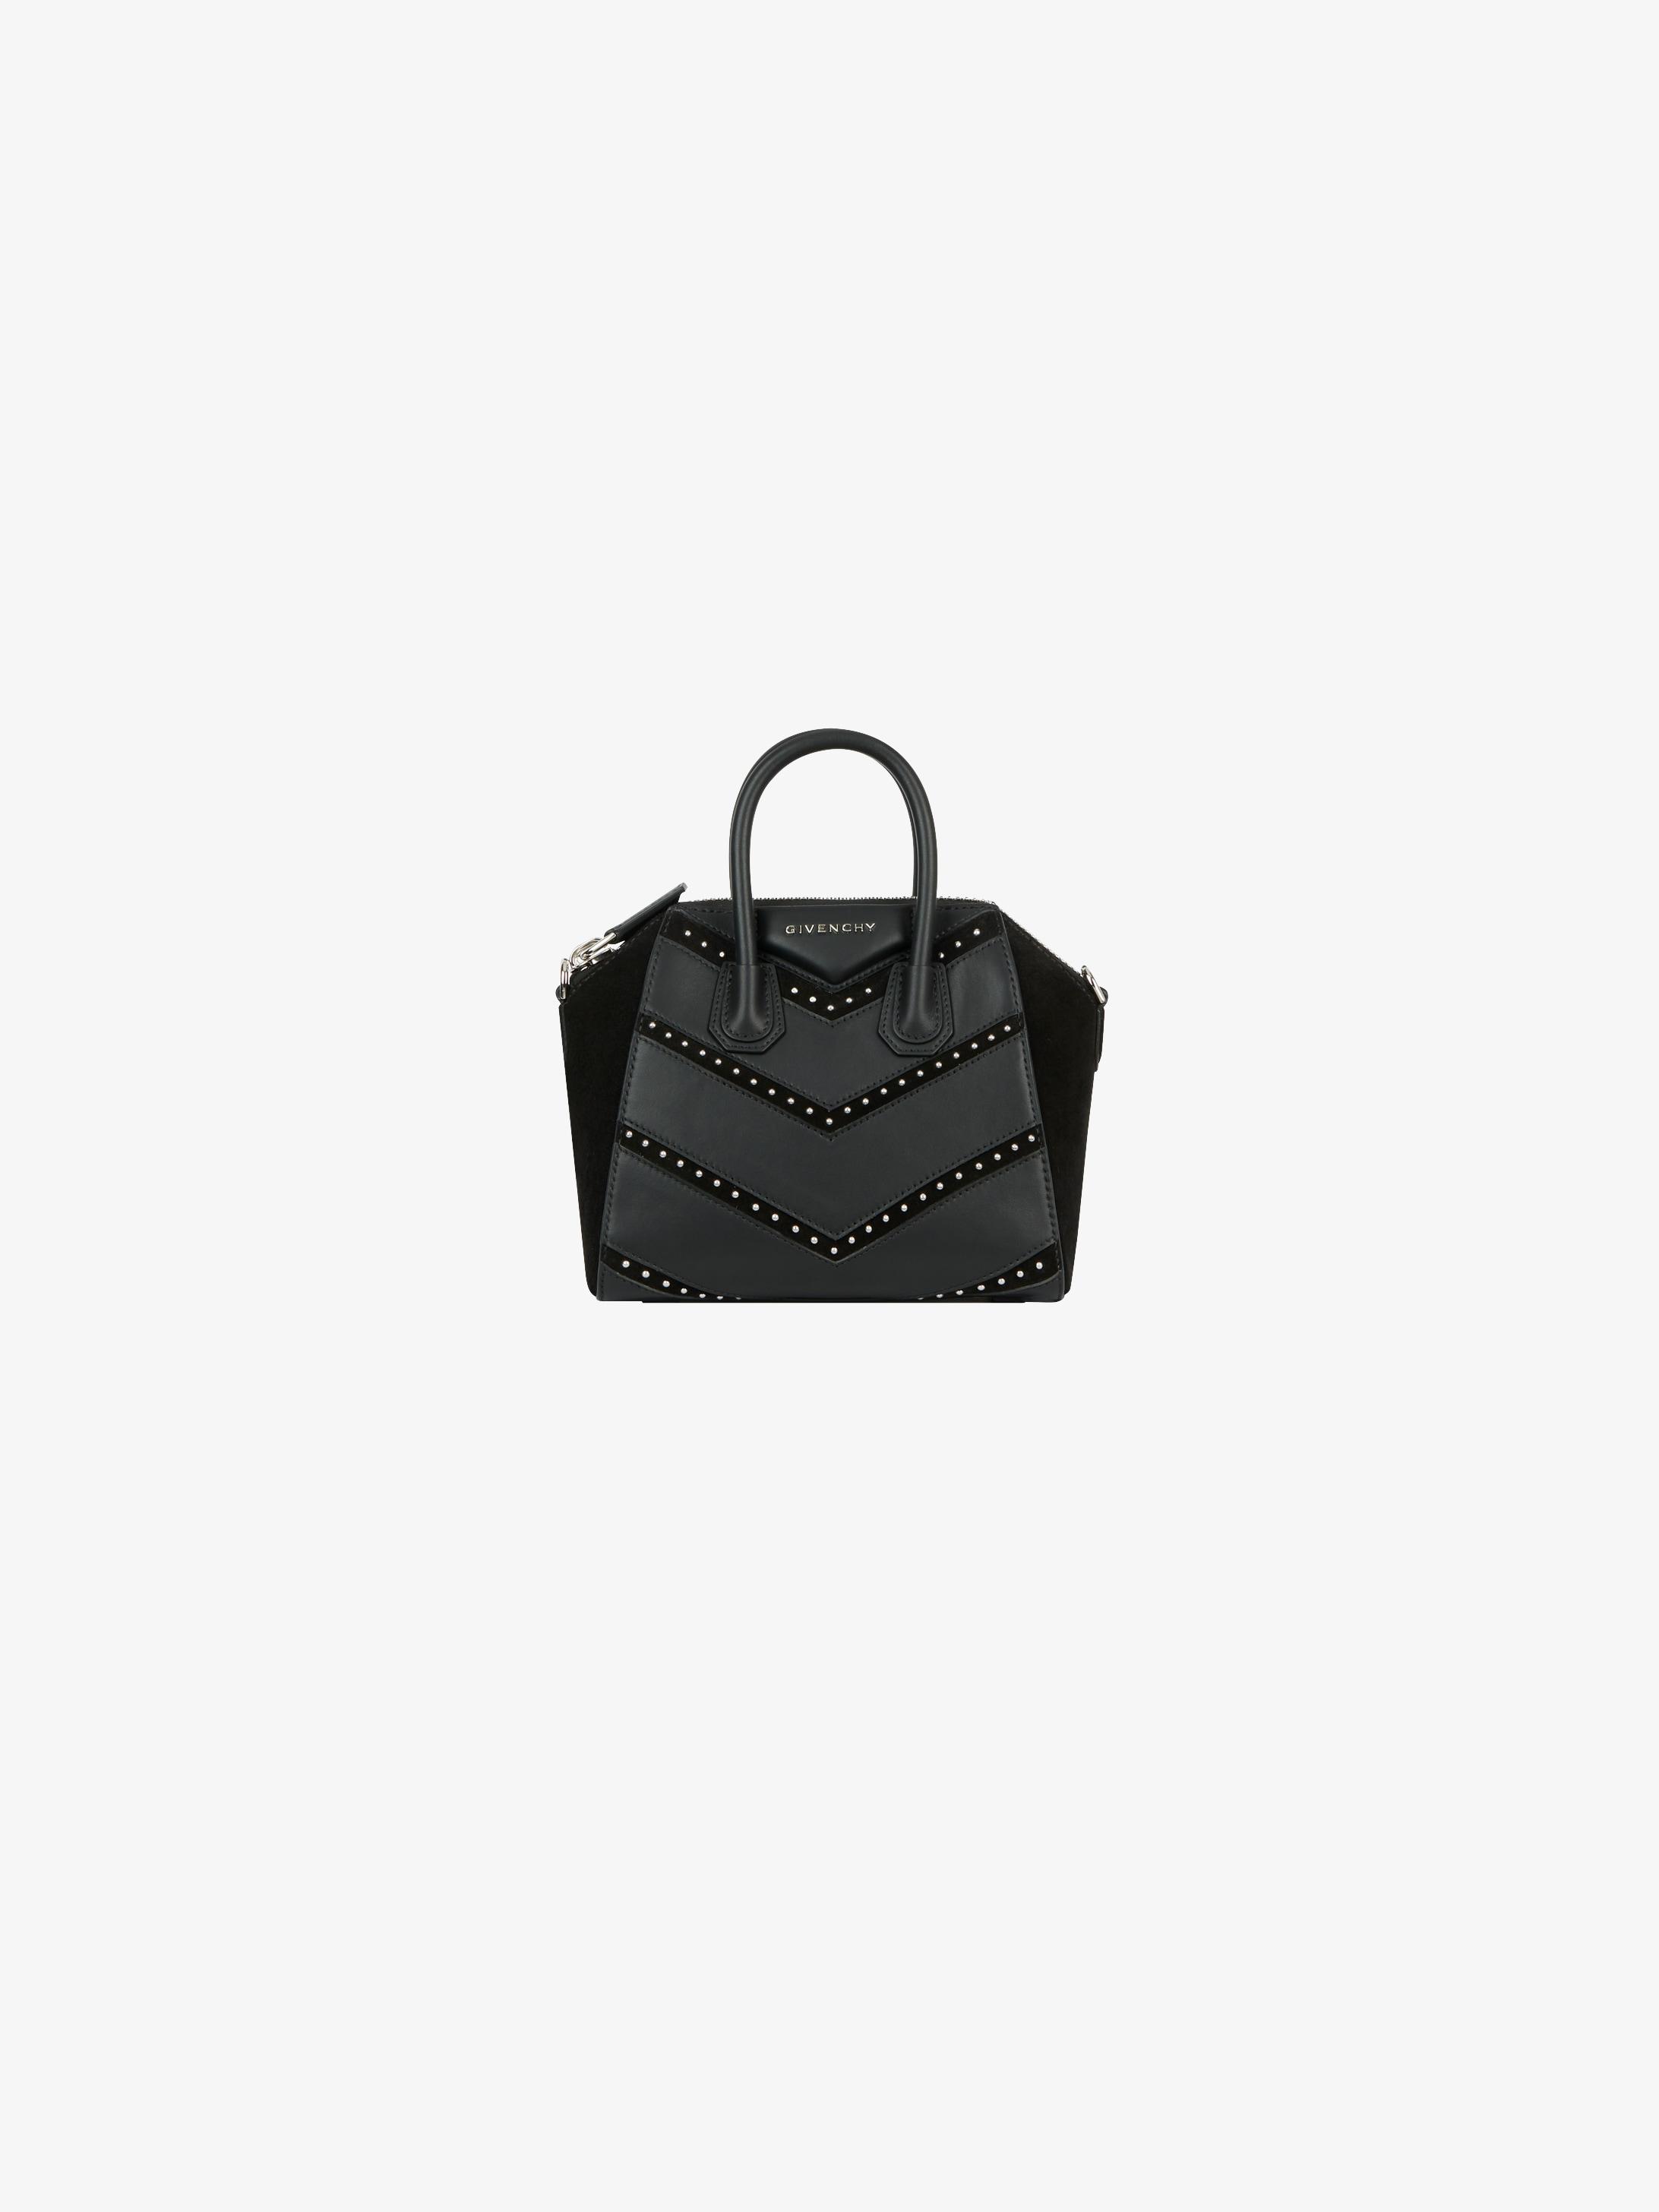 Mini Antigona bag in leather and suede